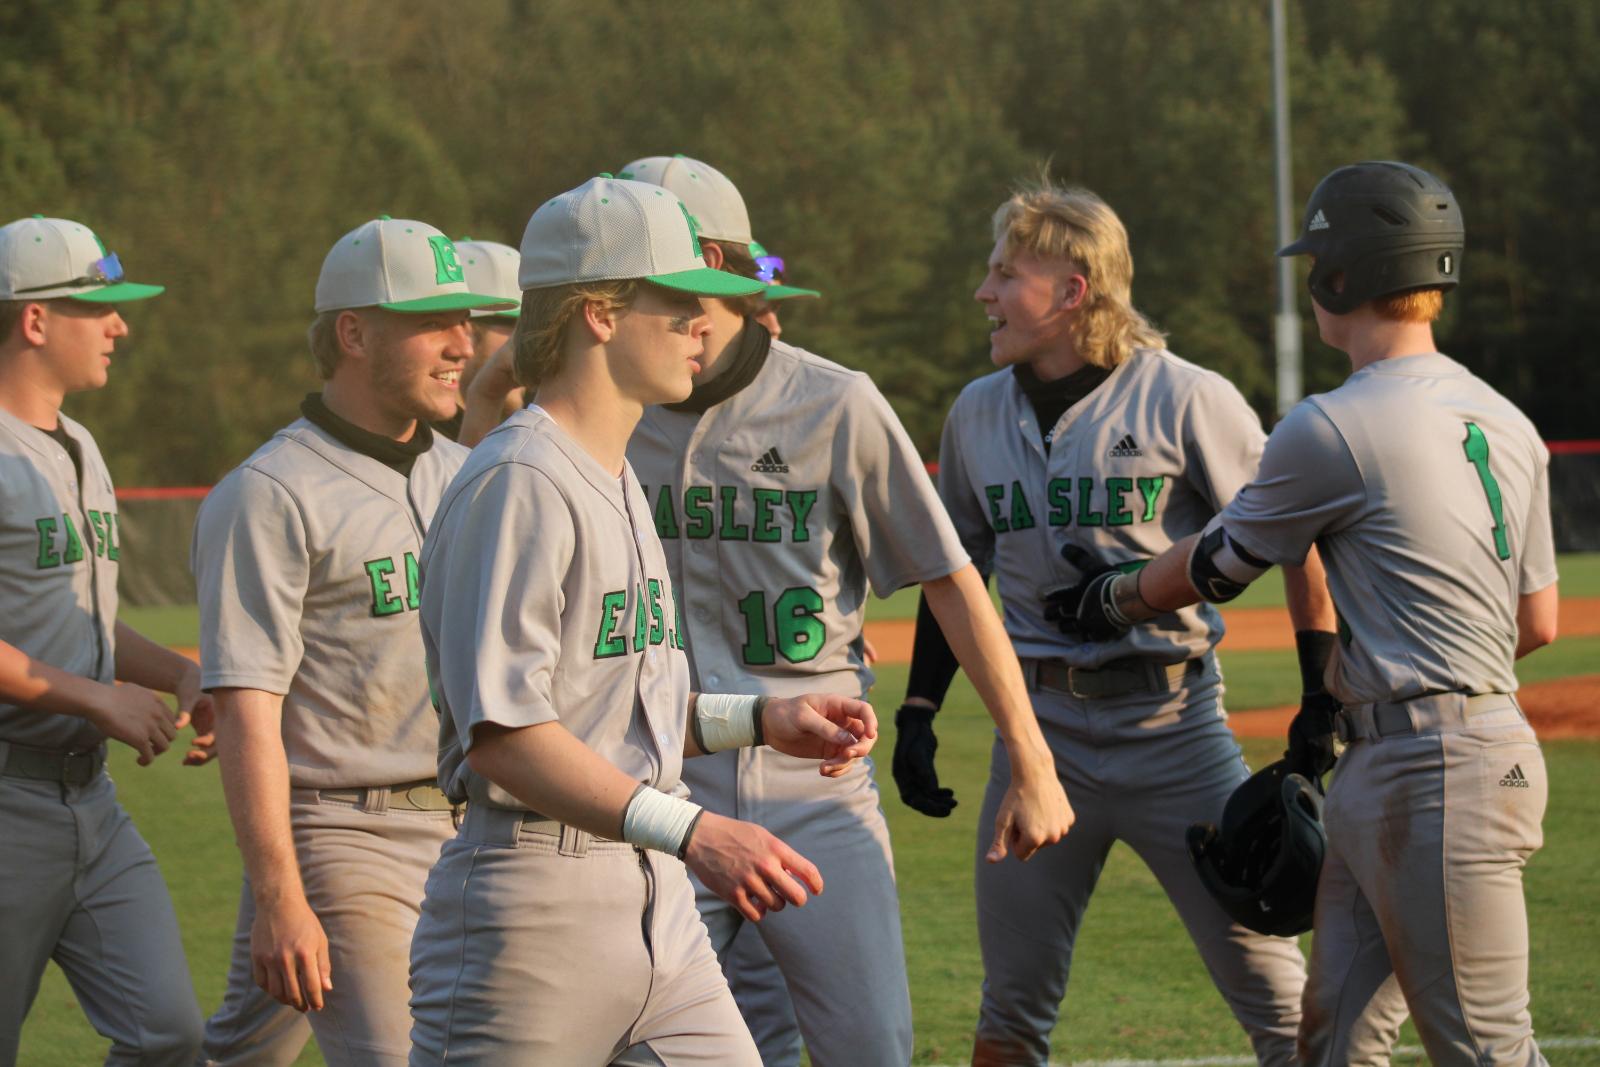 PHOTO GALLERY: Varsity Baseball vs JL Mann